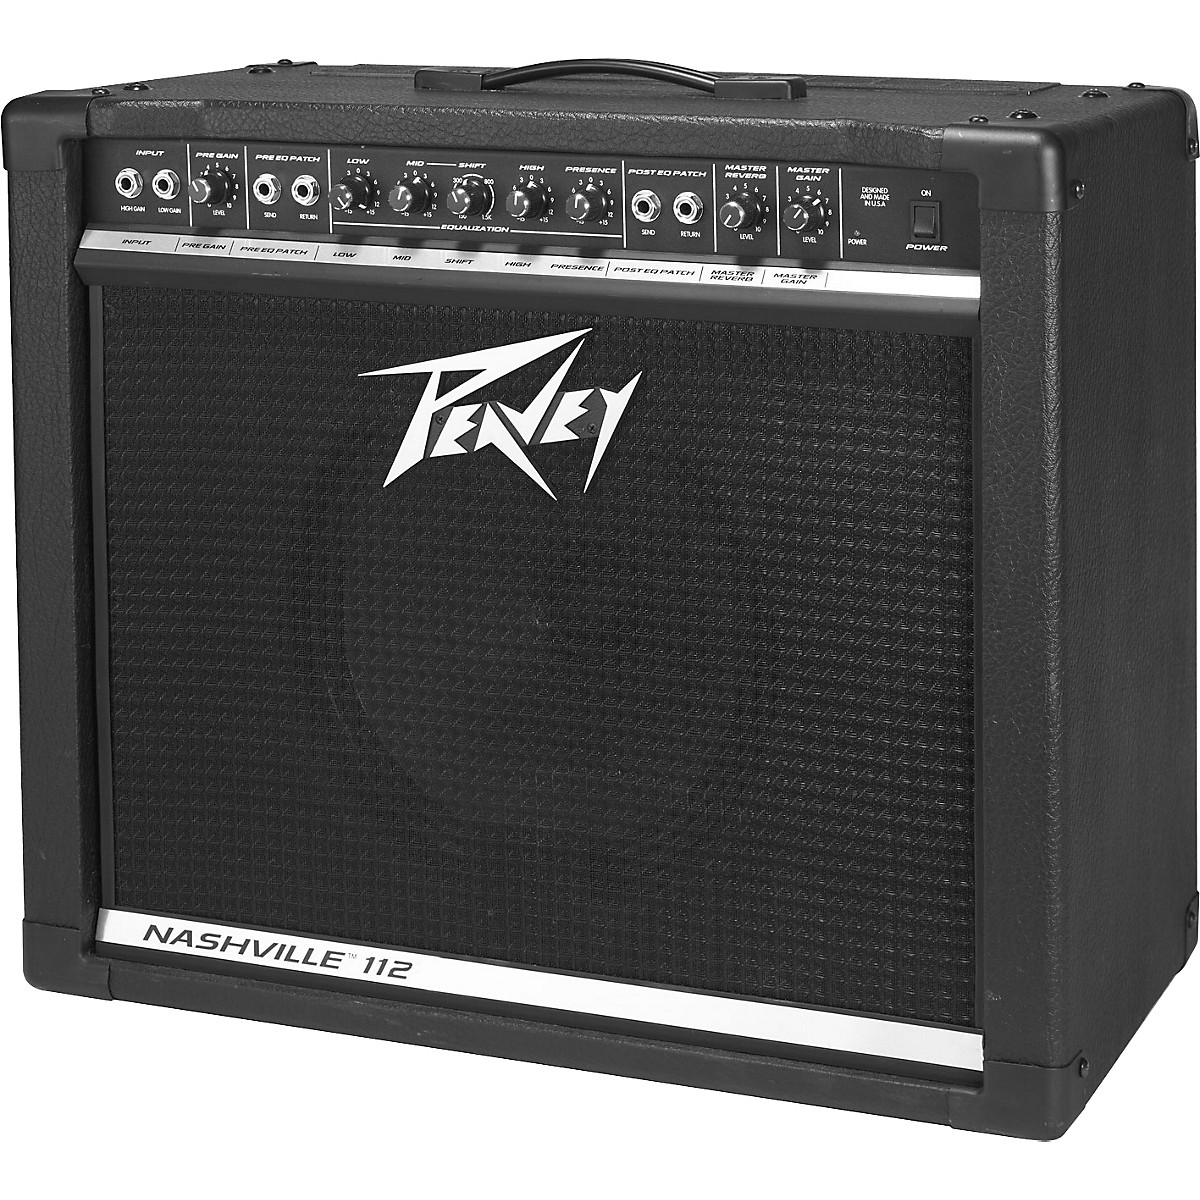 Peavey Nashville 112 1x12 80W Amp